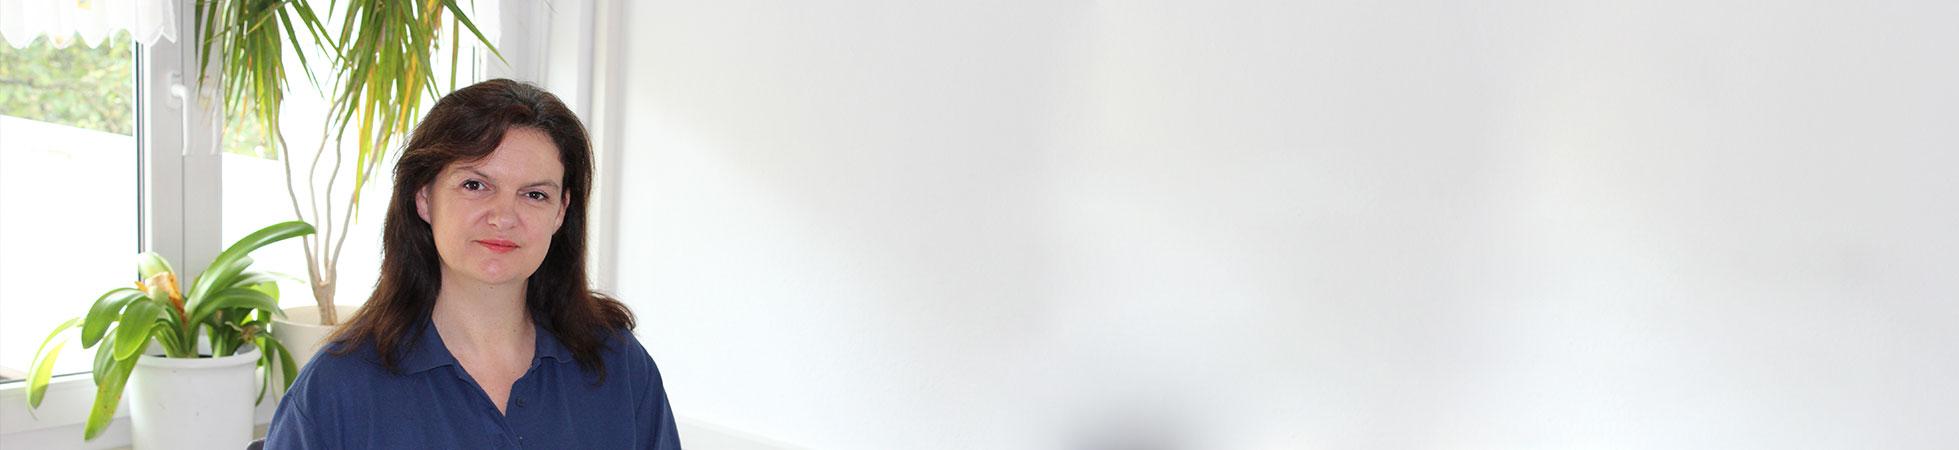 kinderkrankenpflege intensivpflege und beatmung mobiler pflegedienst christian. Black Bedroom Furniture Sets. Home Design Ideas